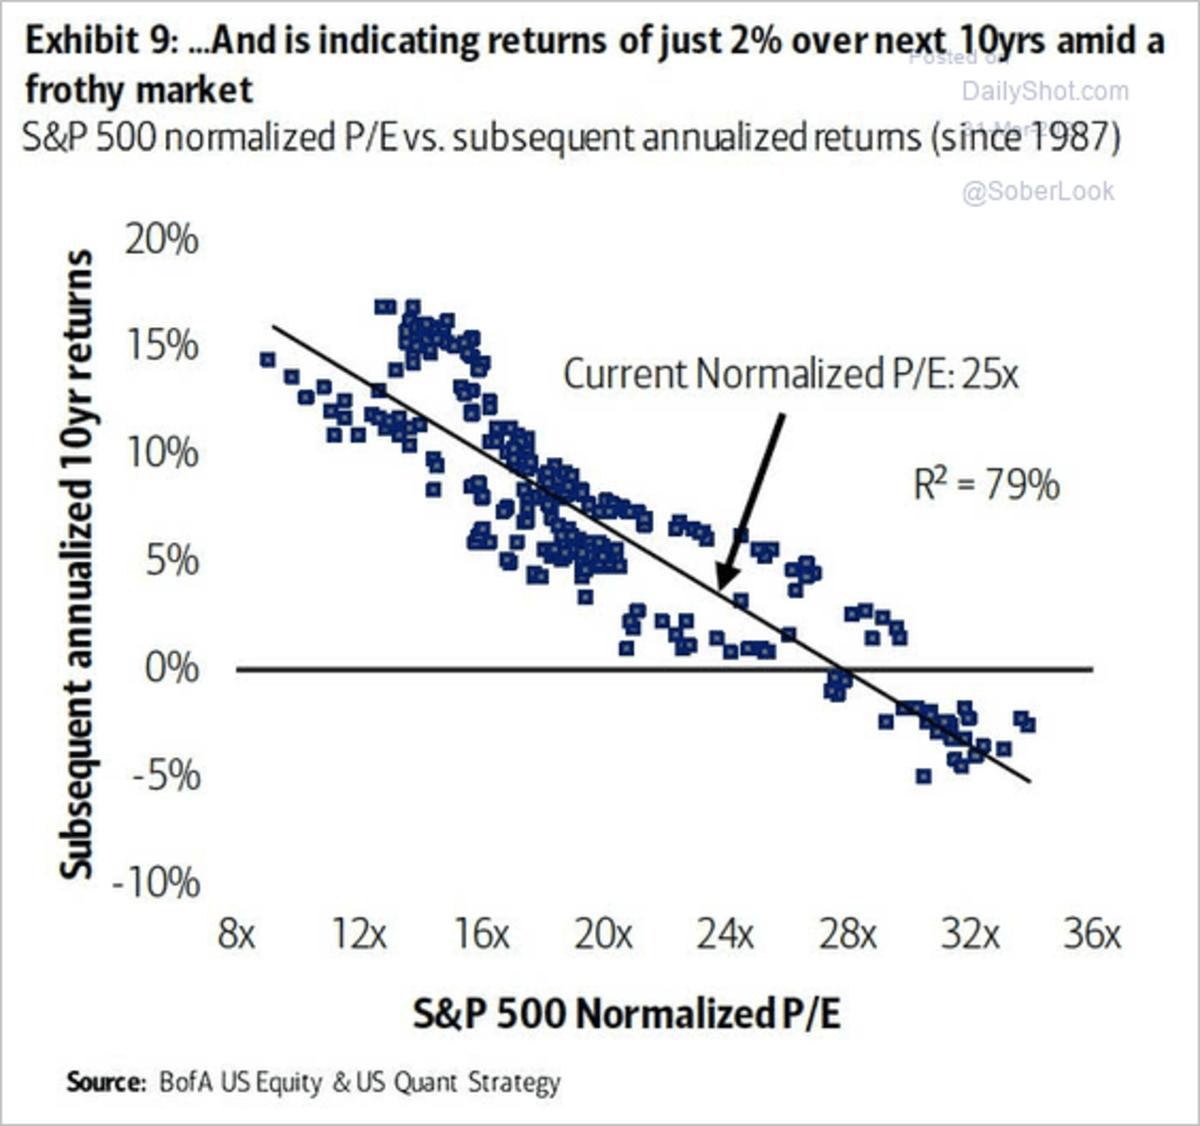 S&P 500 Historical Returns based on P/E Ratio